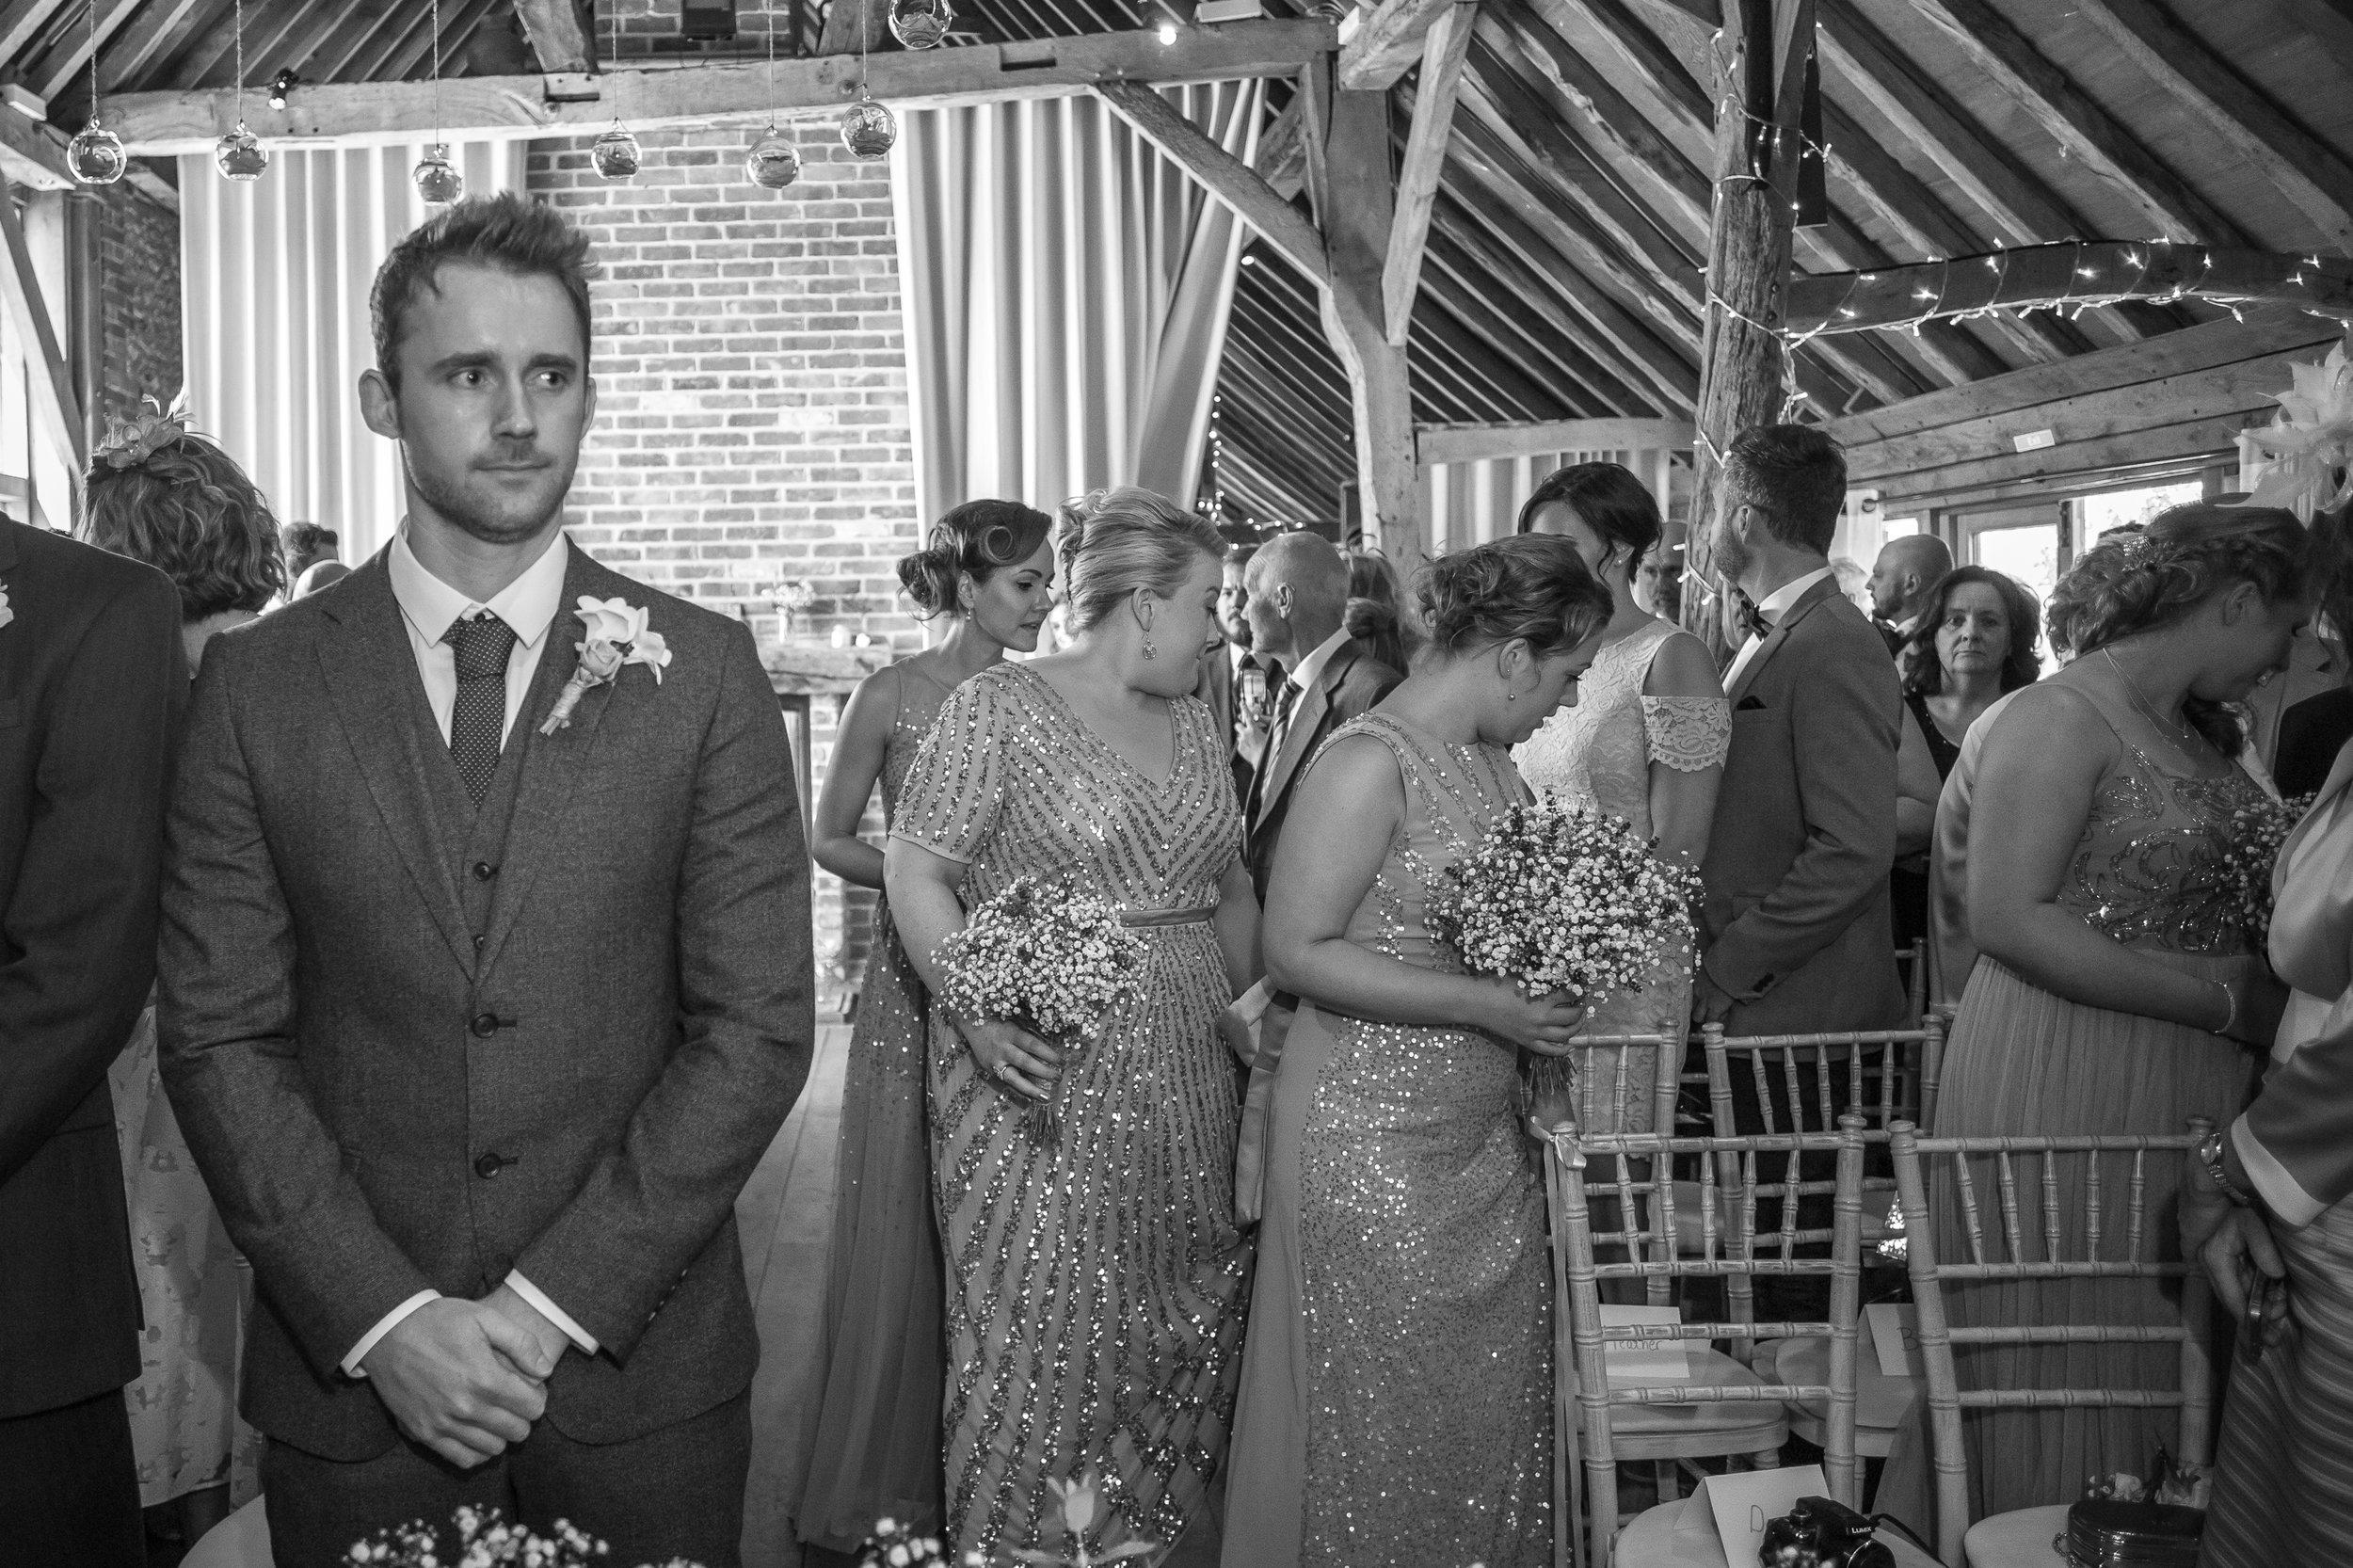 Grittenham Barn female wedding photographers west sussex petworth social-48.jpg